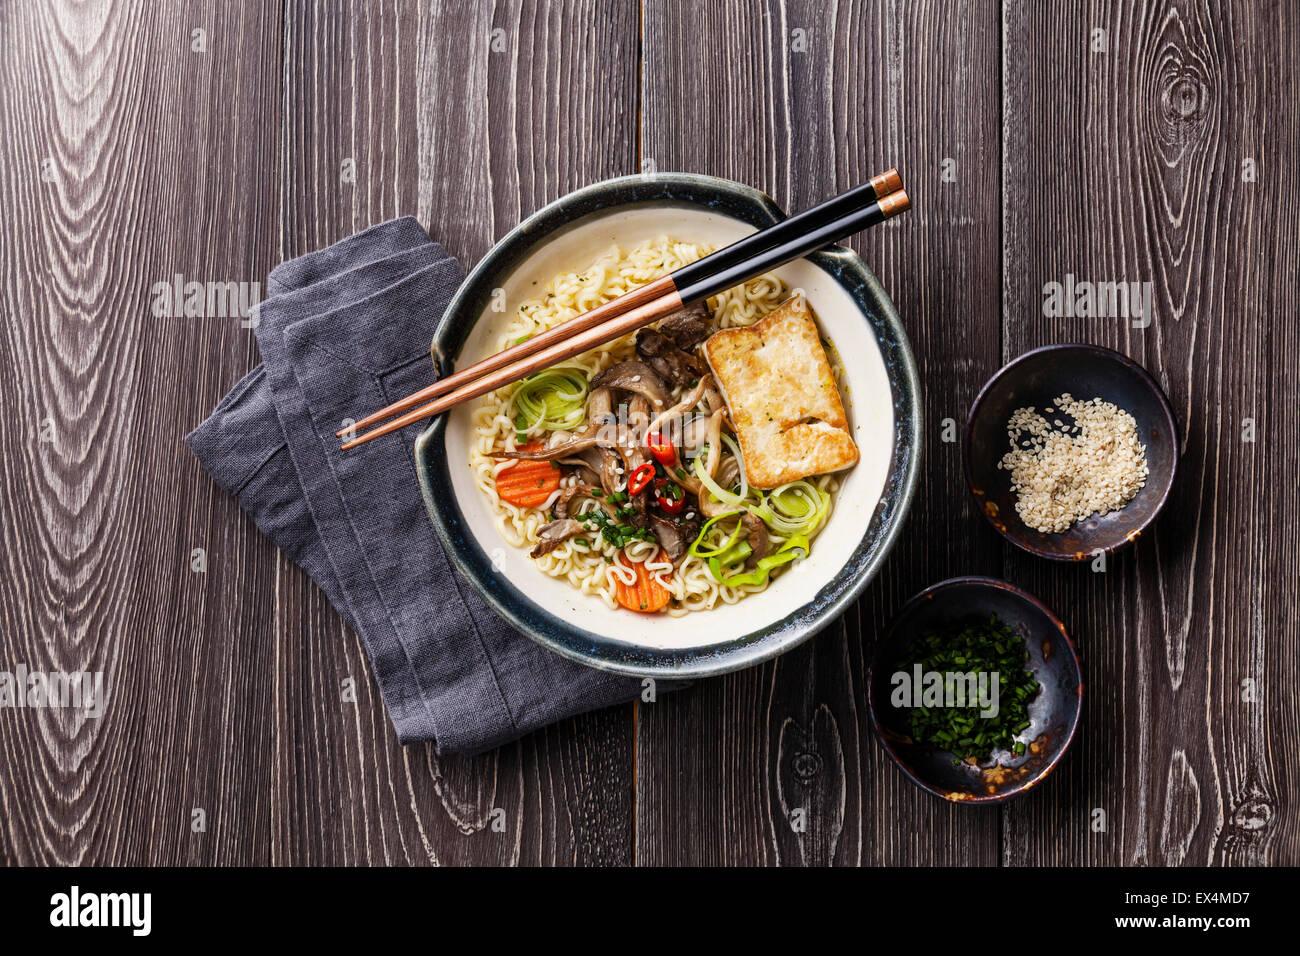 Fideos asiáticos con tofu, setas y verduras en un tazón sobre fondo de madera gris Imagen De Stock